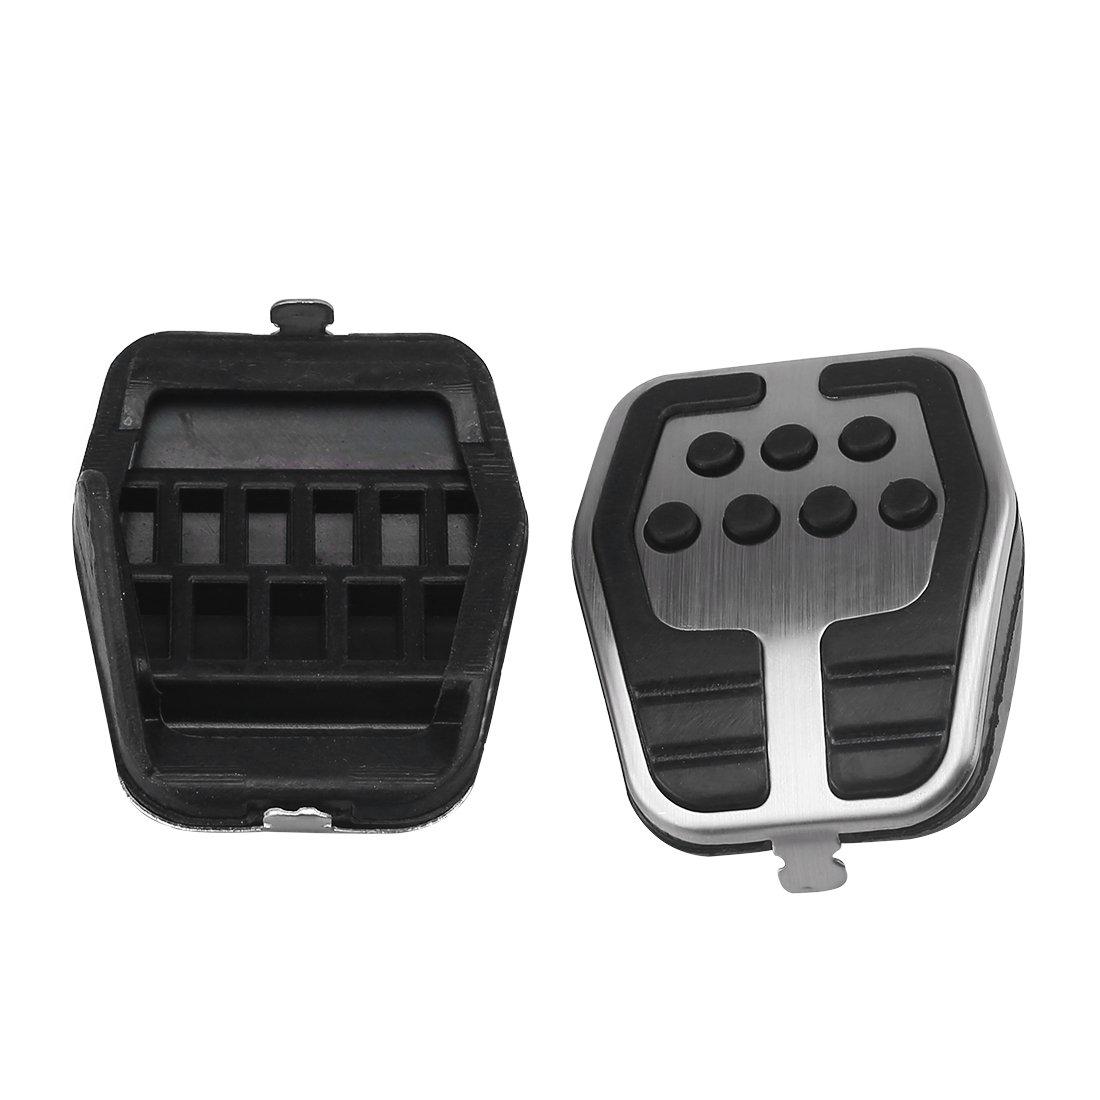 Race Style rutsch Gummi leicht und robust Pedal Cover suparee Auto Pedal Pad Cover Accelerator Brake Clutch Edelstahl passgenau